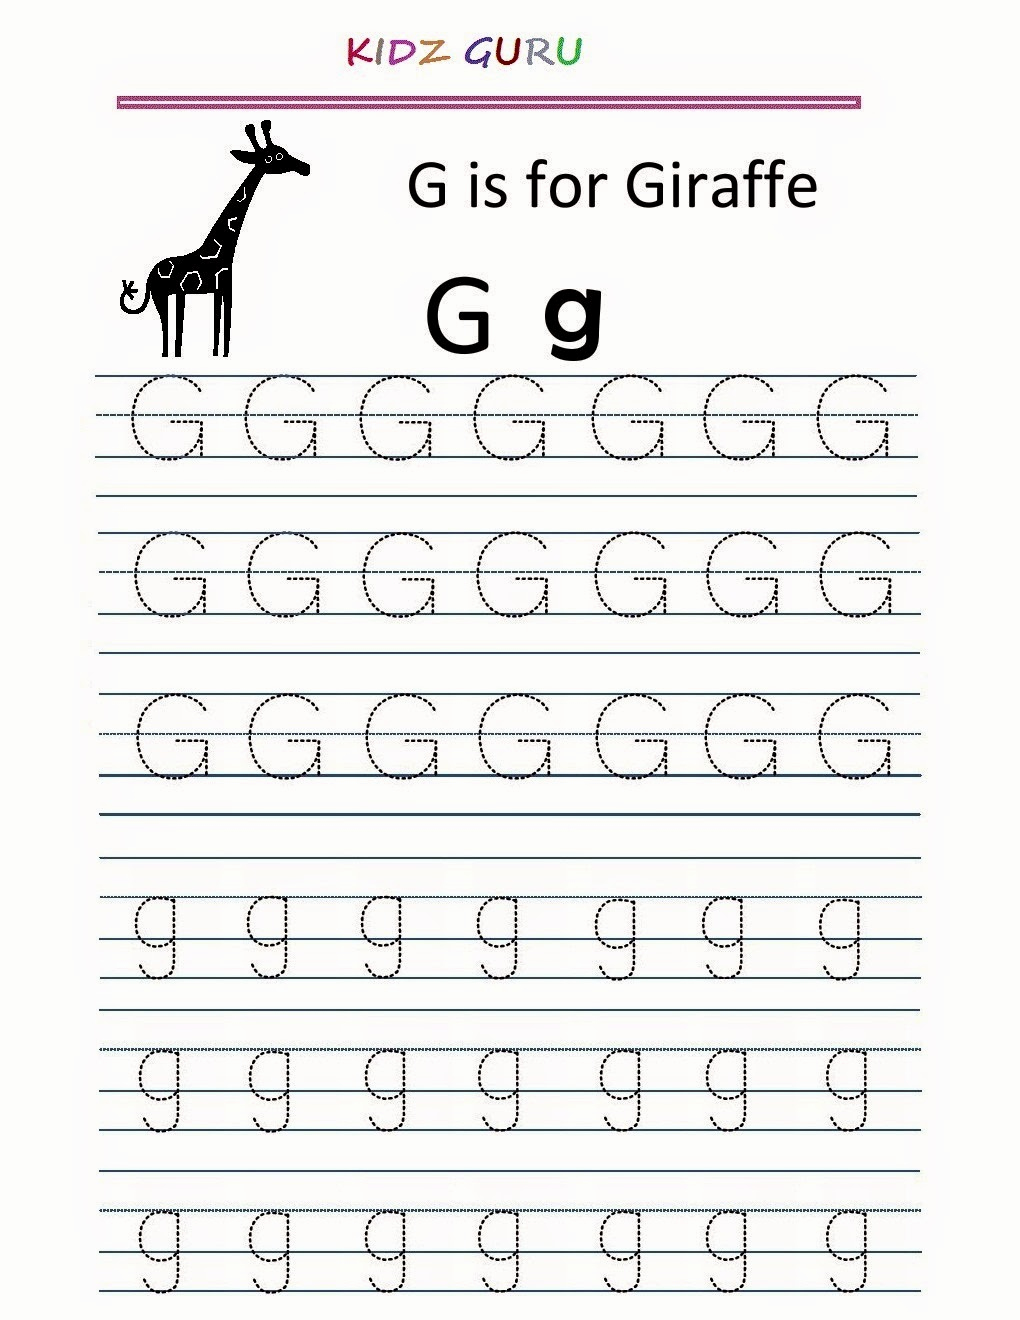 G Worksheets for Preschool Fresh 15 Exciting Letter G Worksheets for Kids